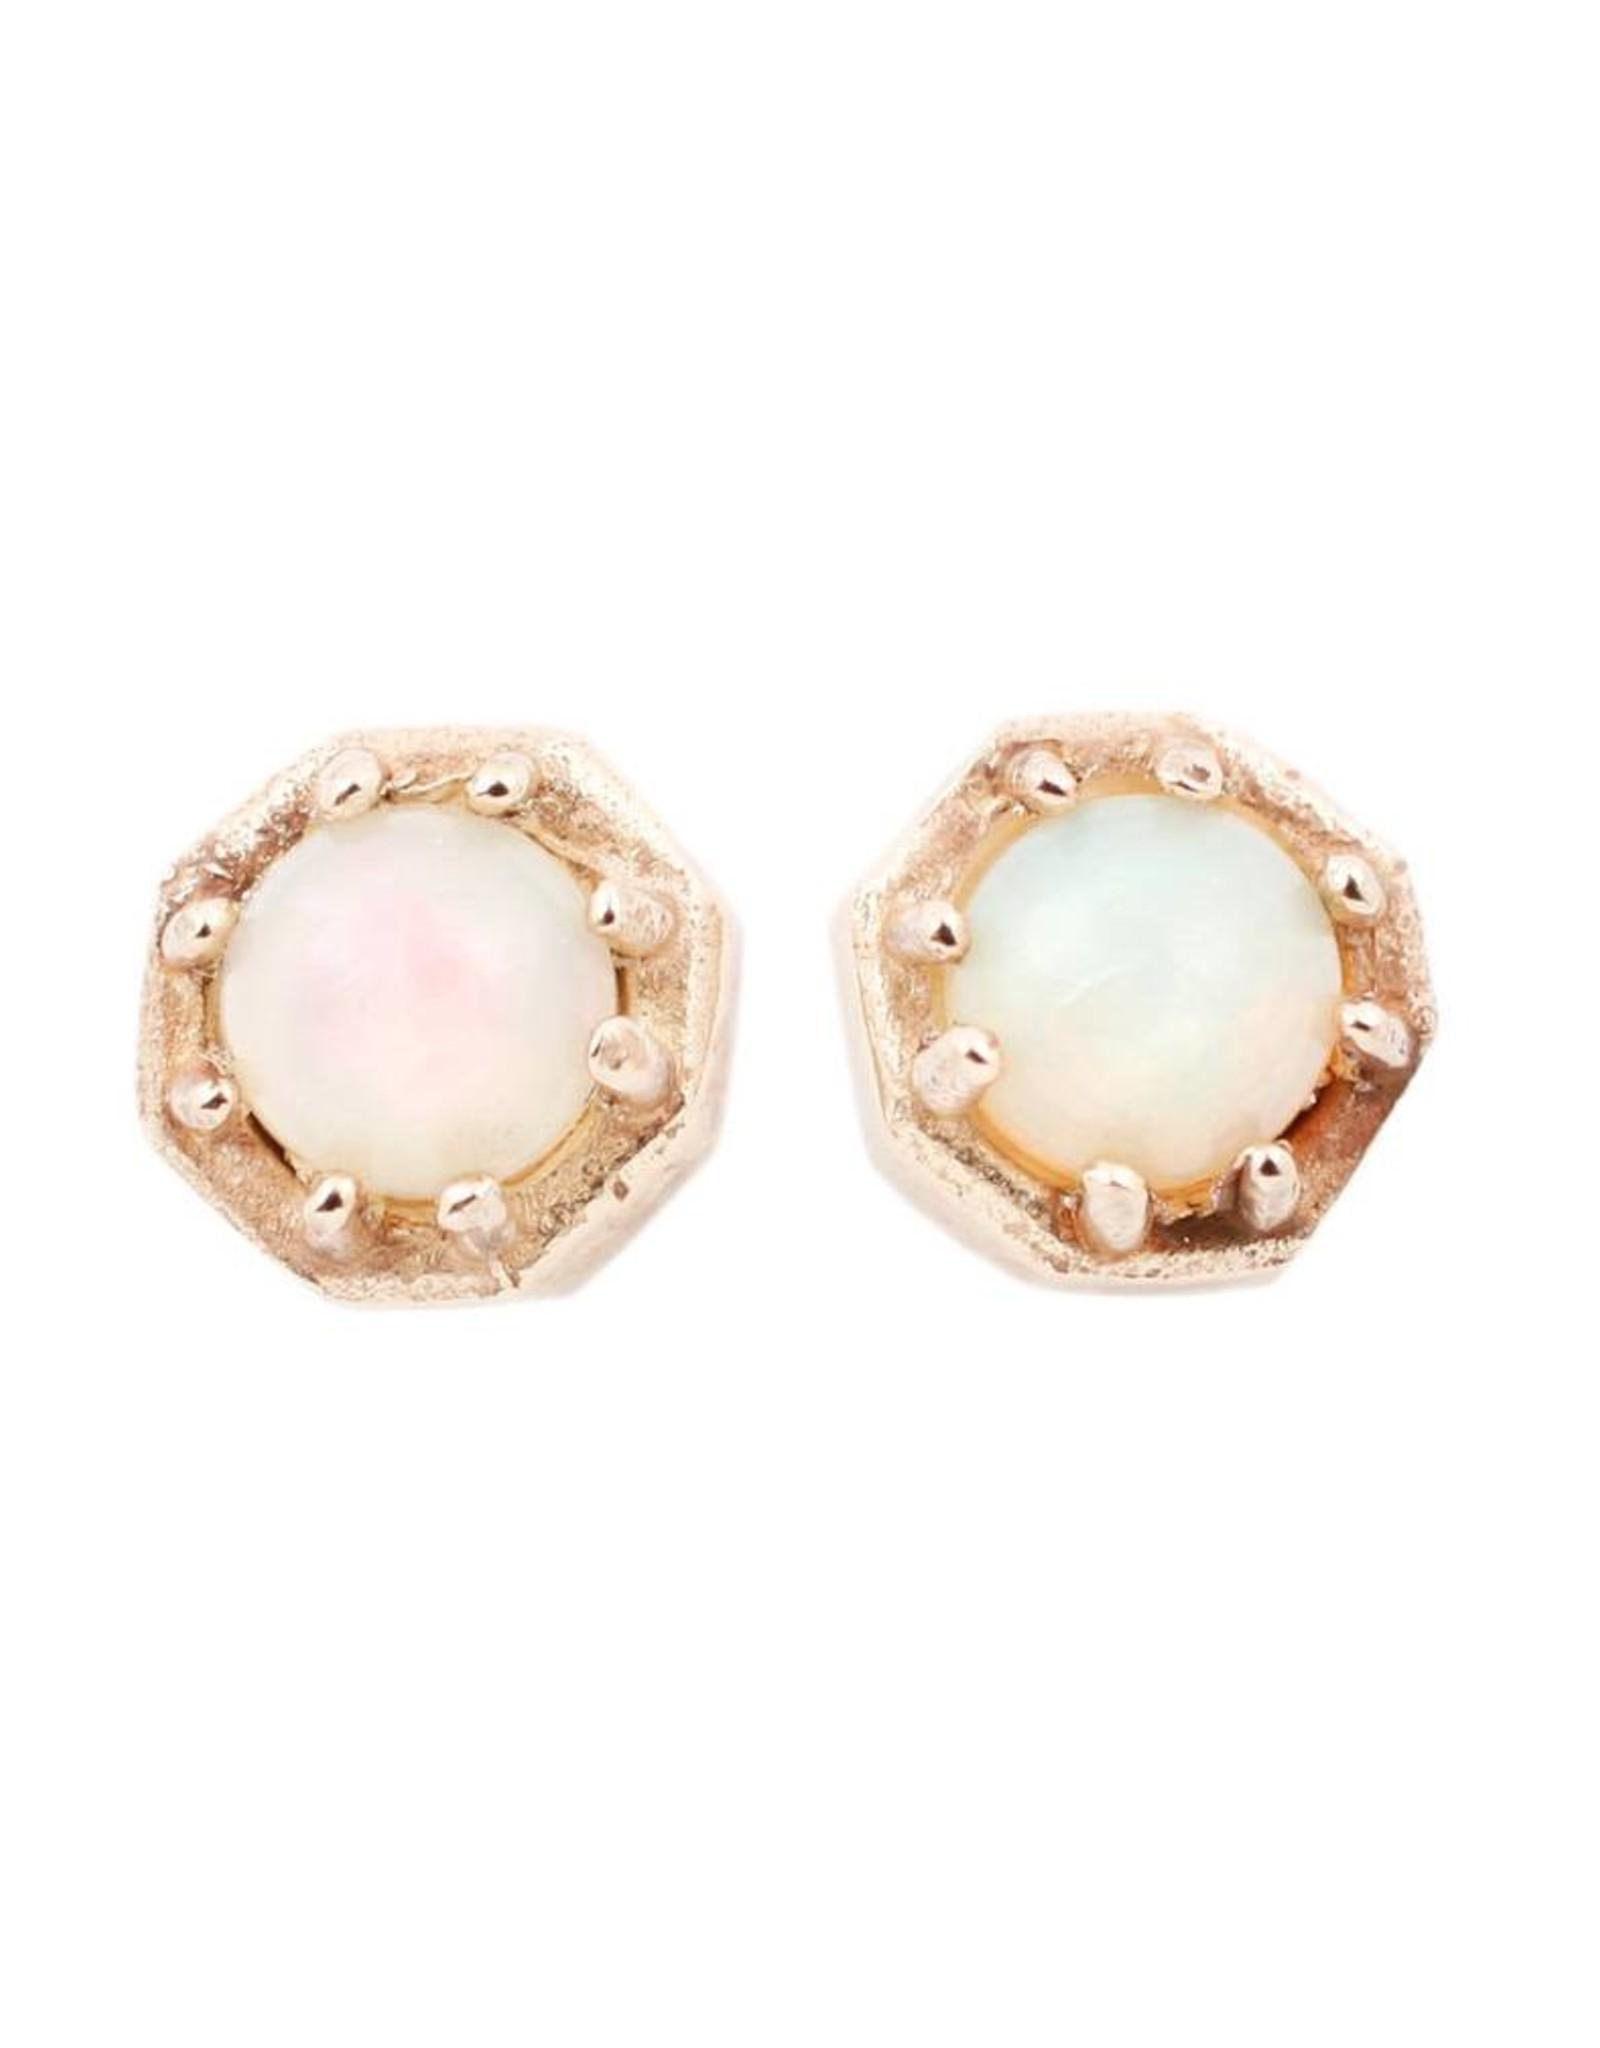 Lauren Wolf Jewelry Tiny Gold Octagon Studs - Opal